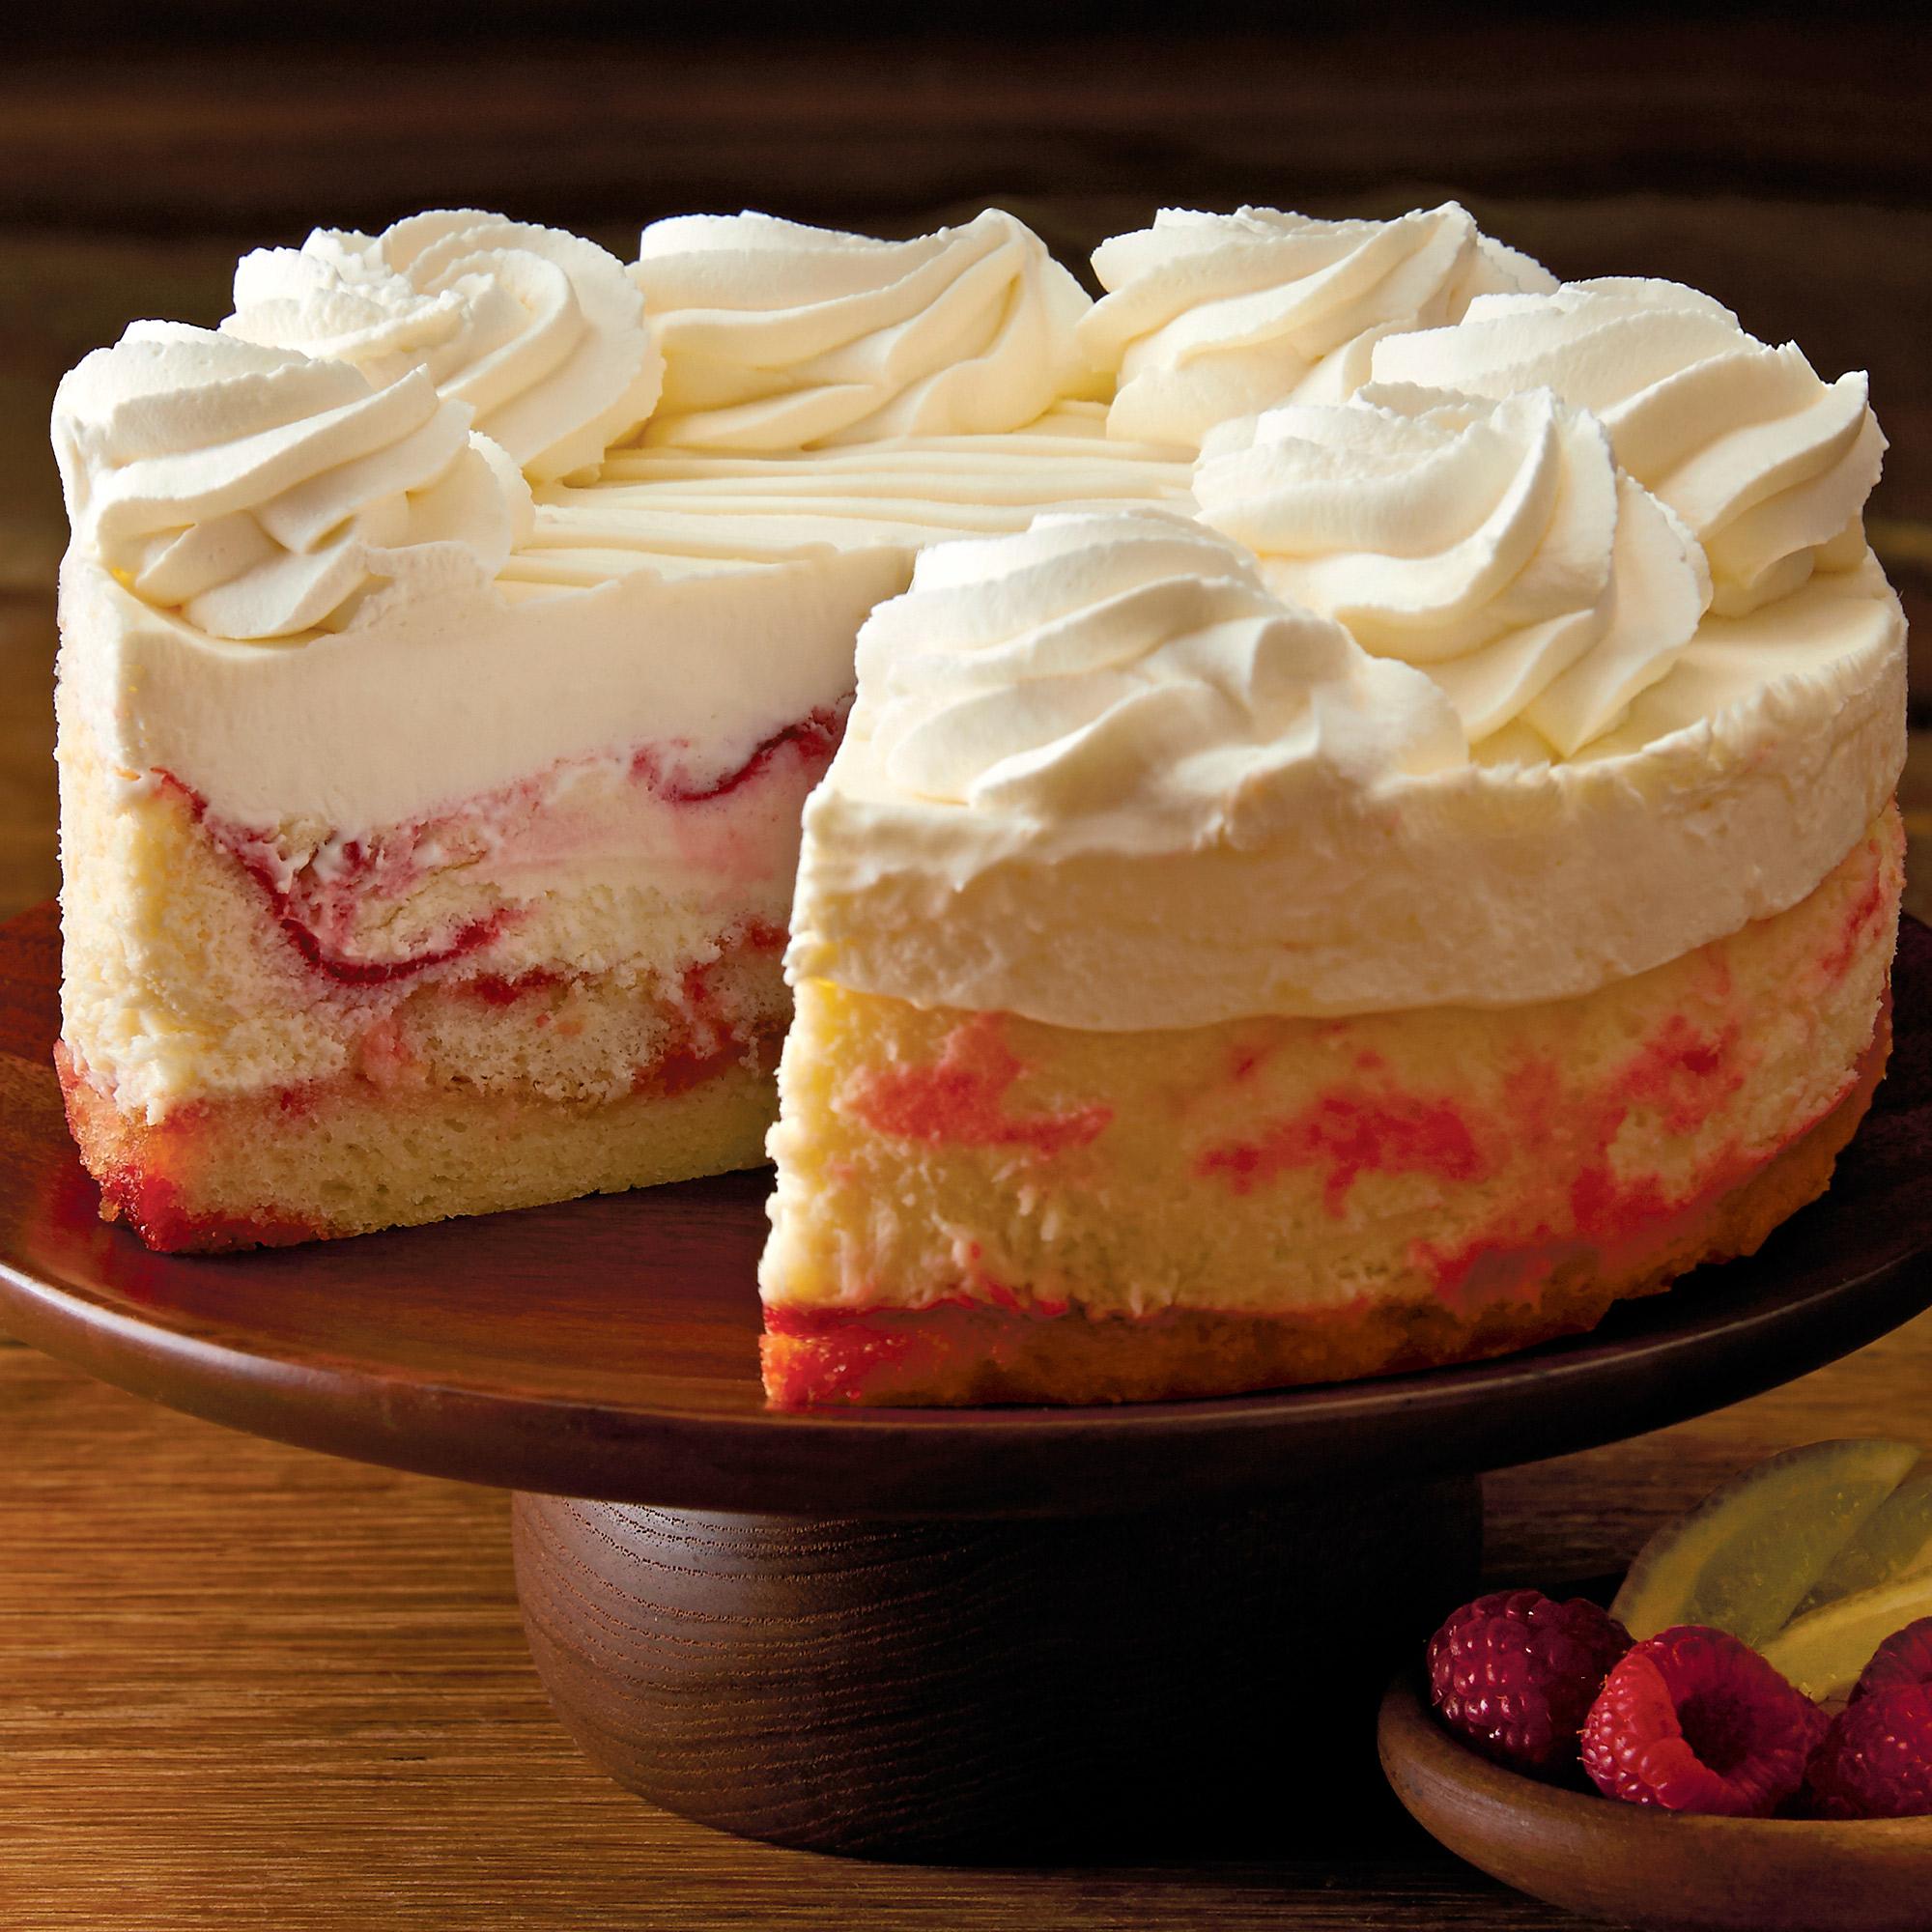 The Cheesecake Factory Lemon Raspberry Cheesecake